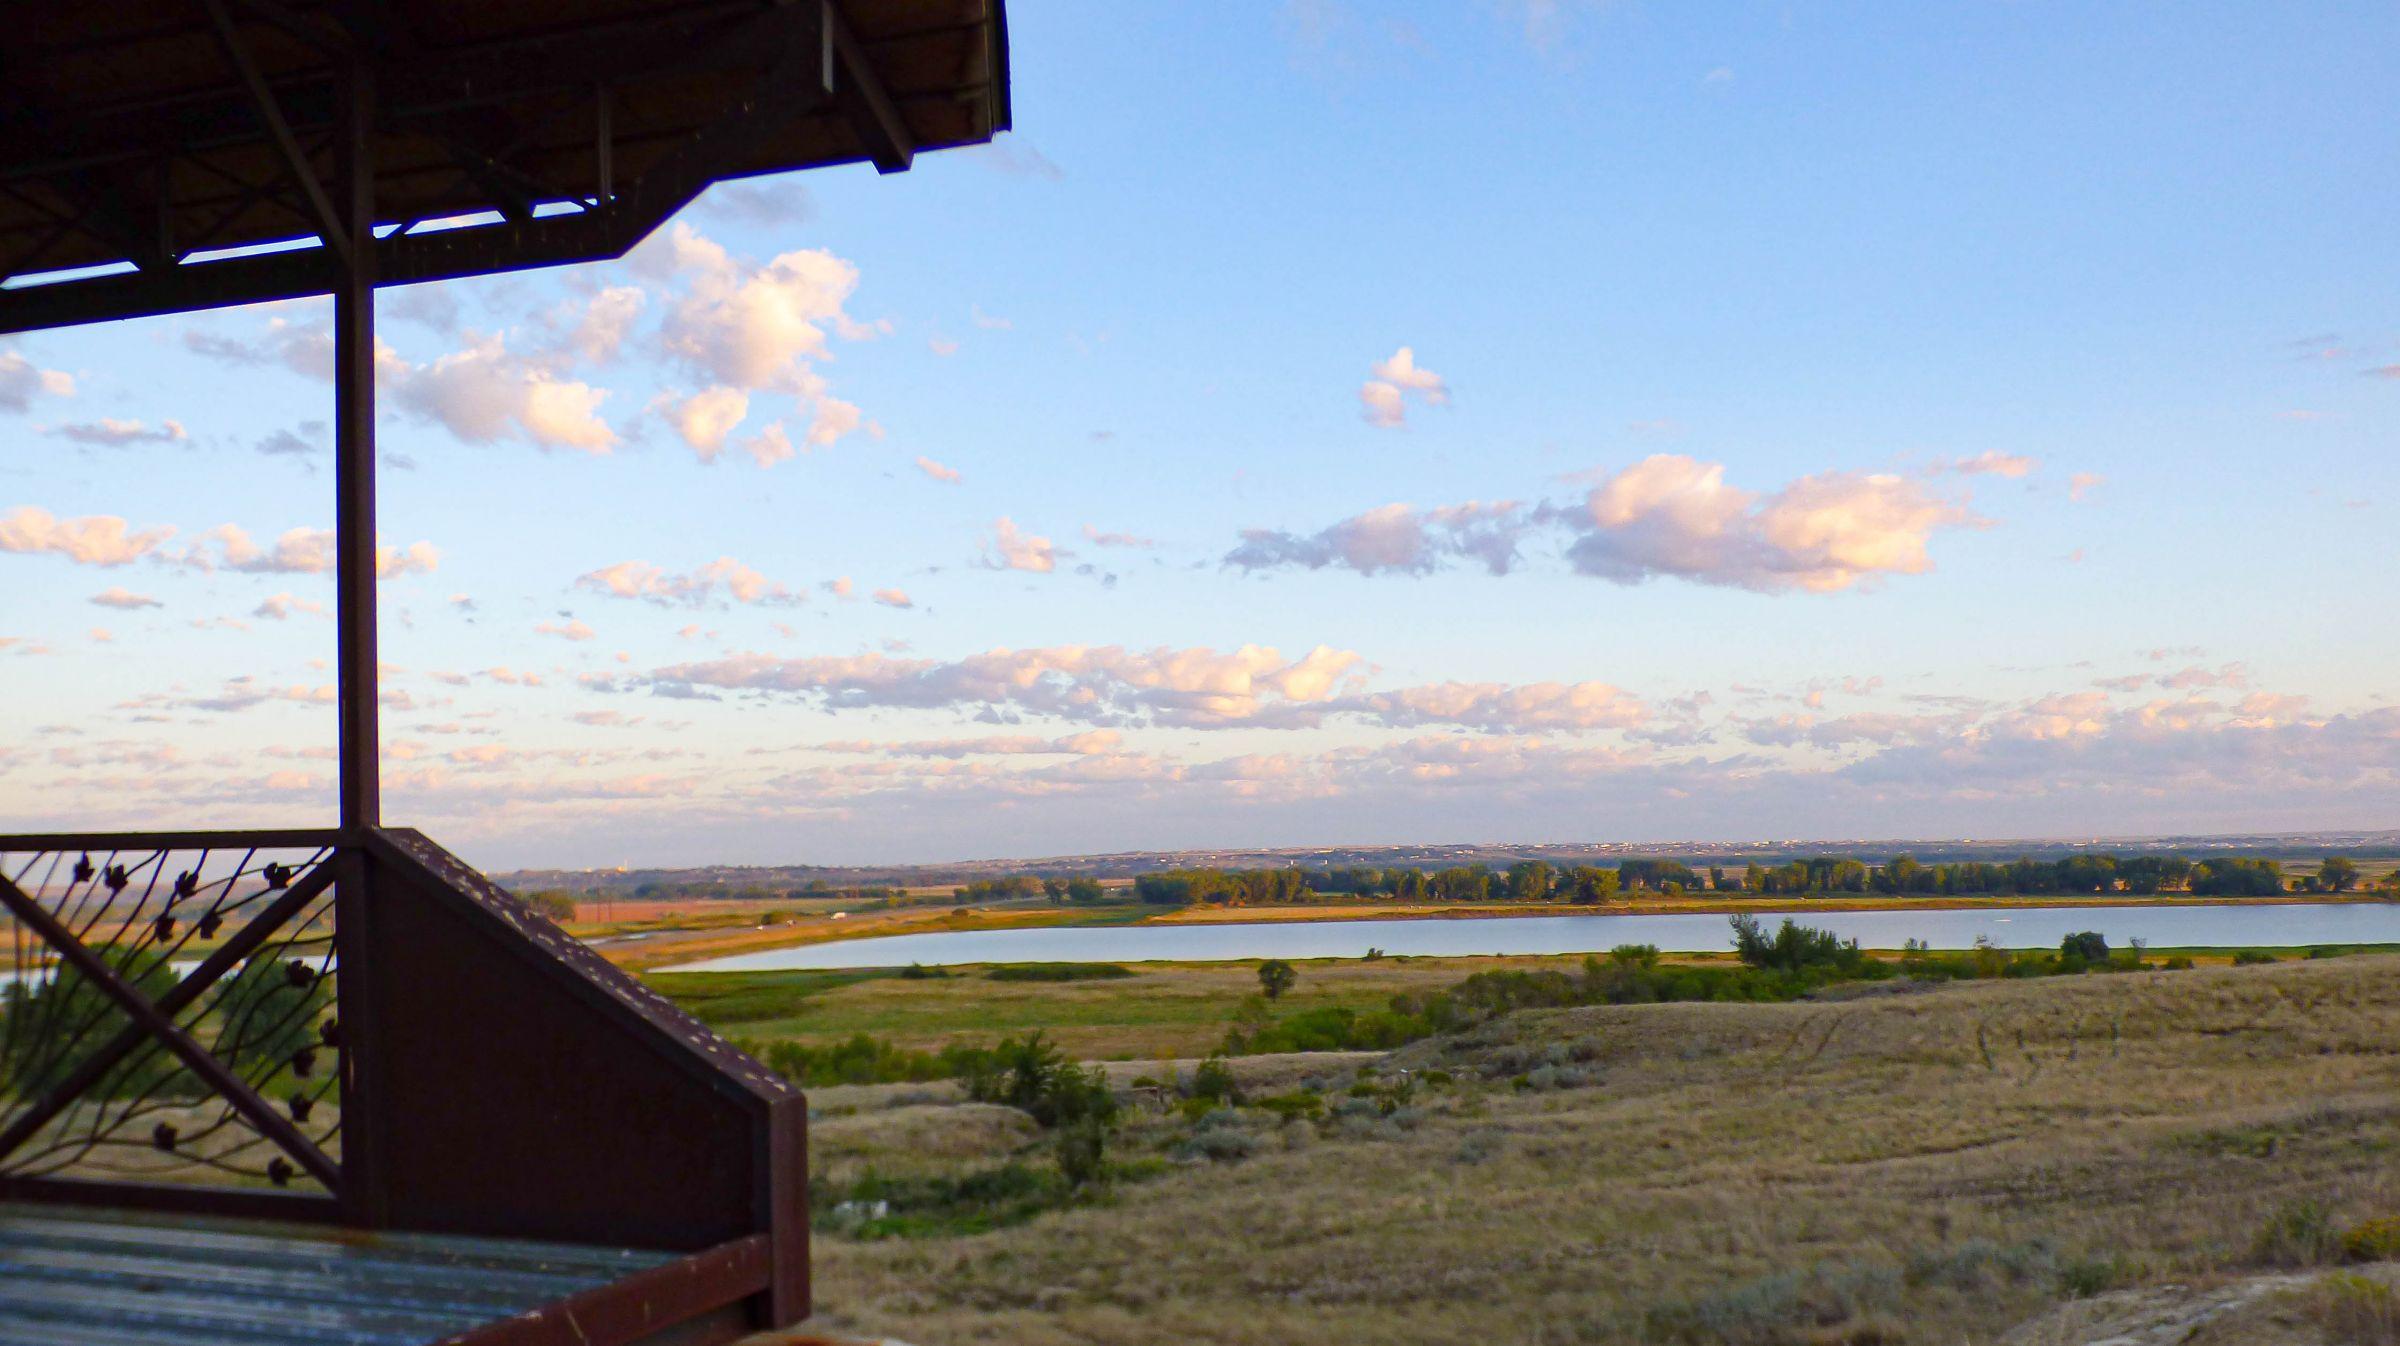 auctions-land-mckenzie-county-north-dakota-270-acres-listing-number-15735-9-2021-09-10-011330.jpg